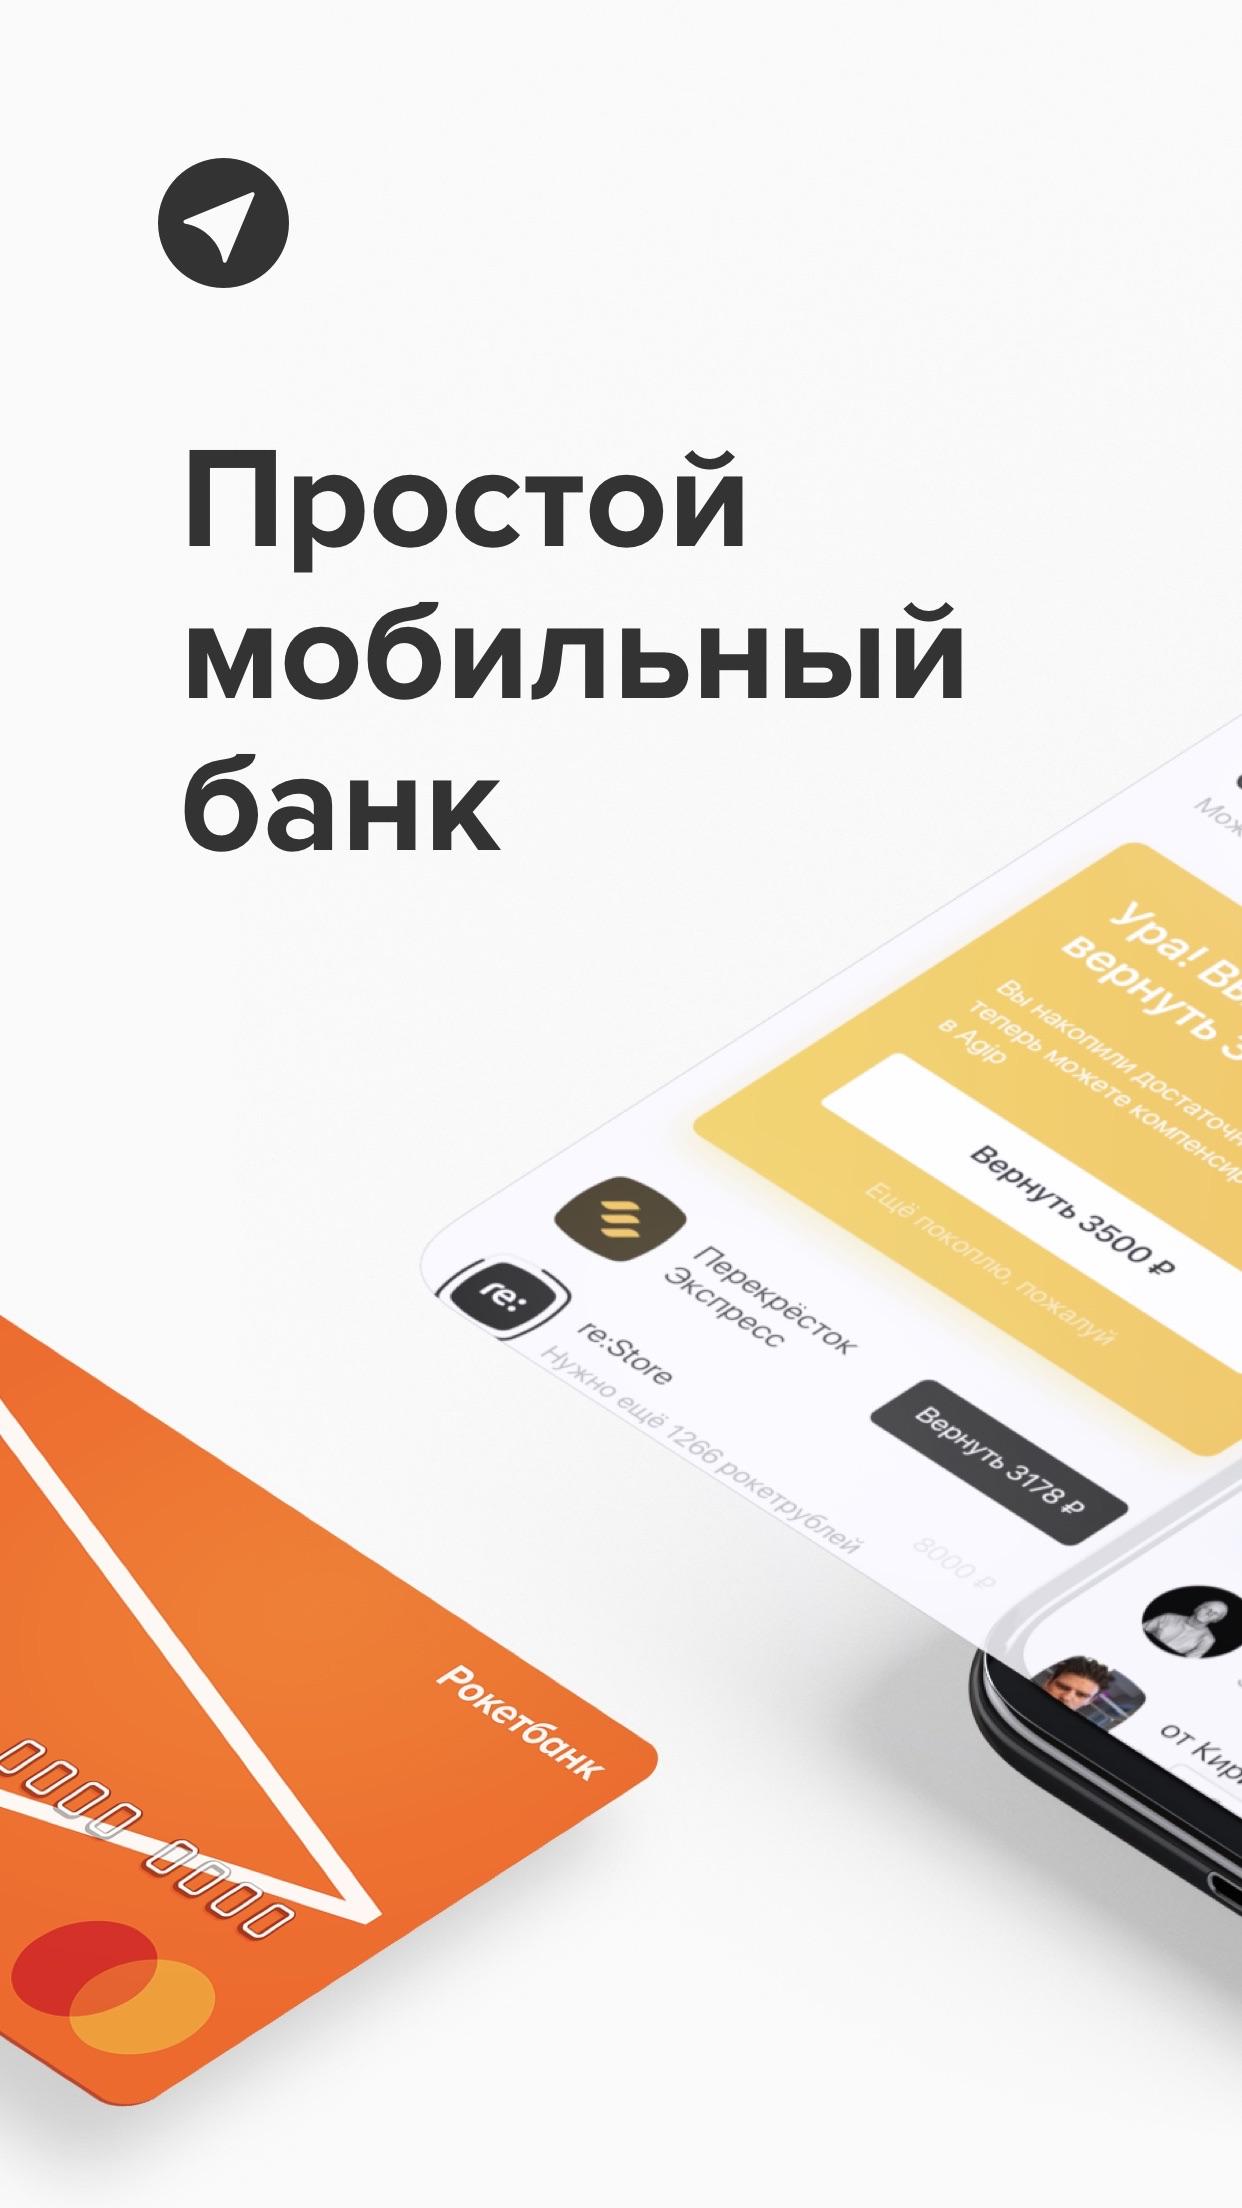 Рокетбанк Screenshot